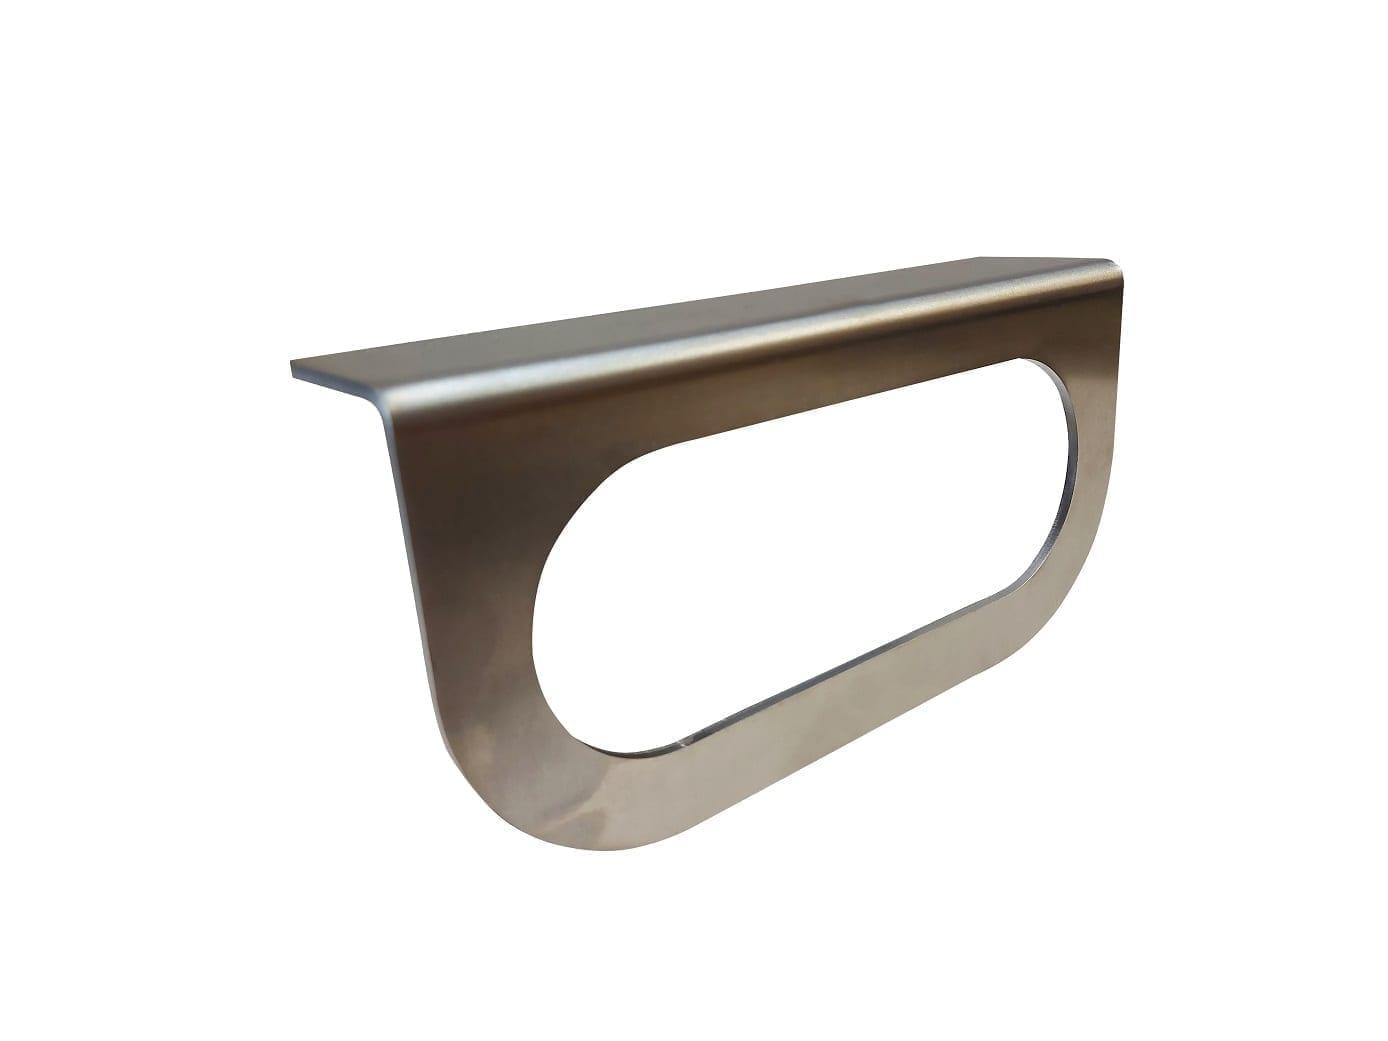 Aluminum Single Oval Light Bracket